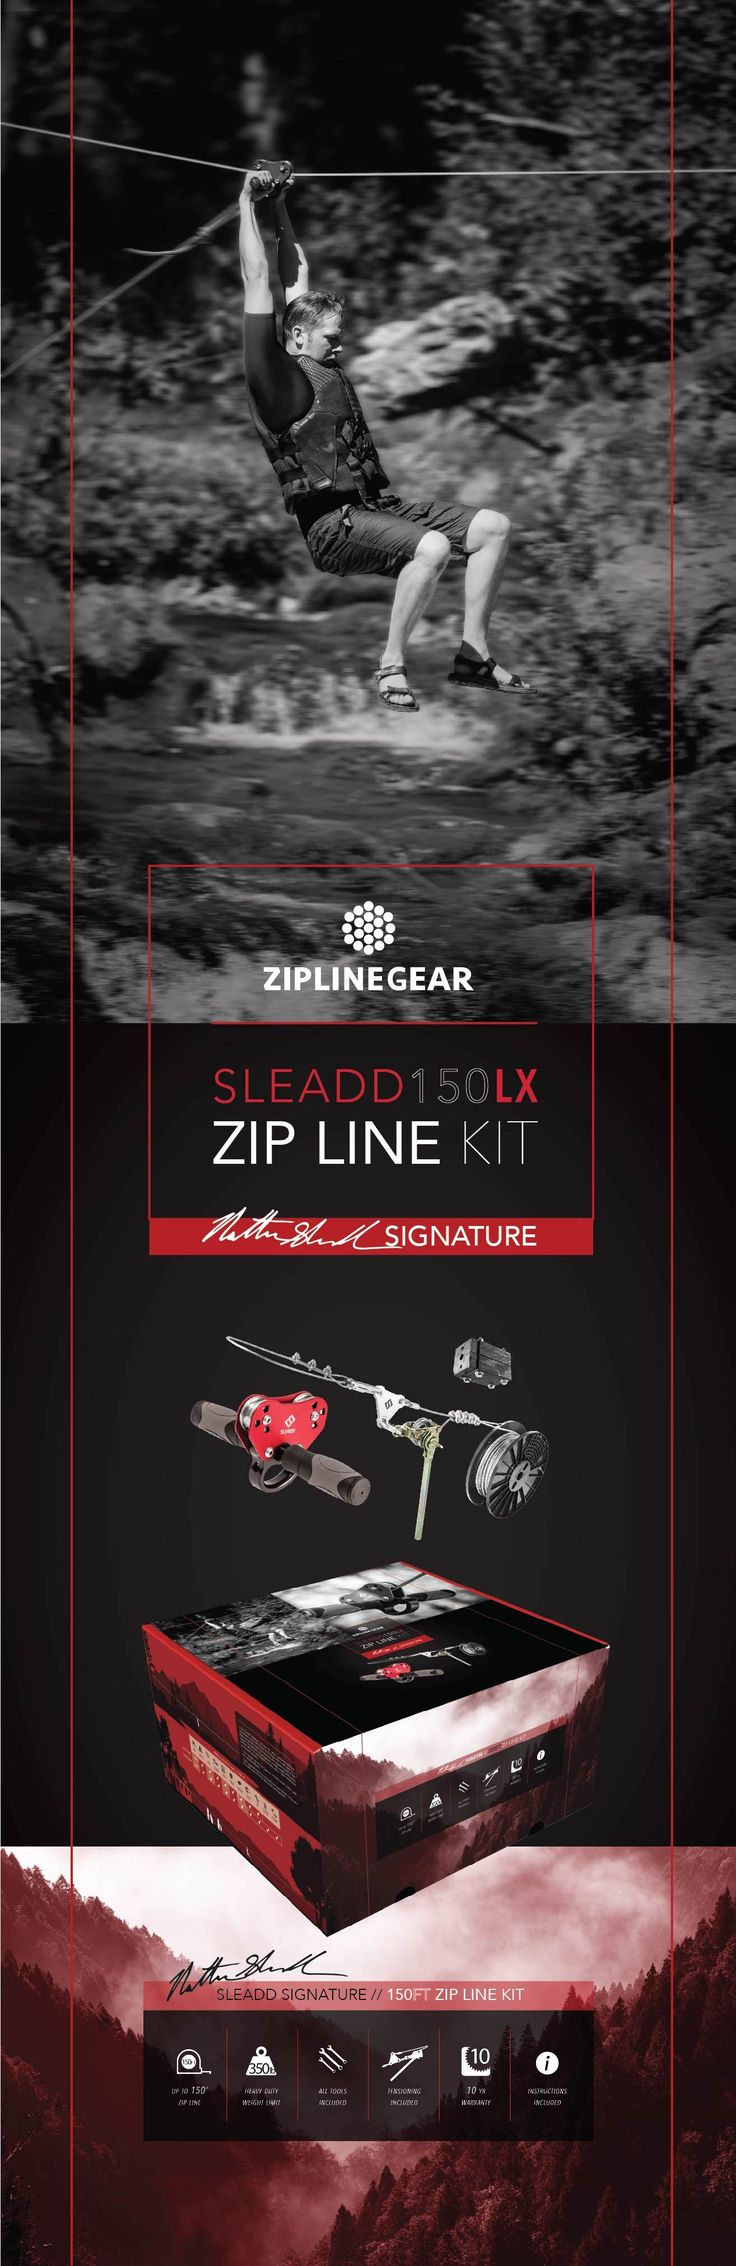 22 best zip line kits images on pinterest gears zip line kits